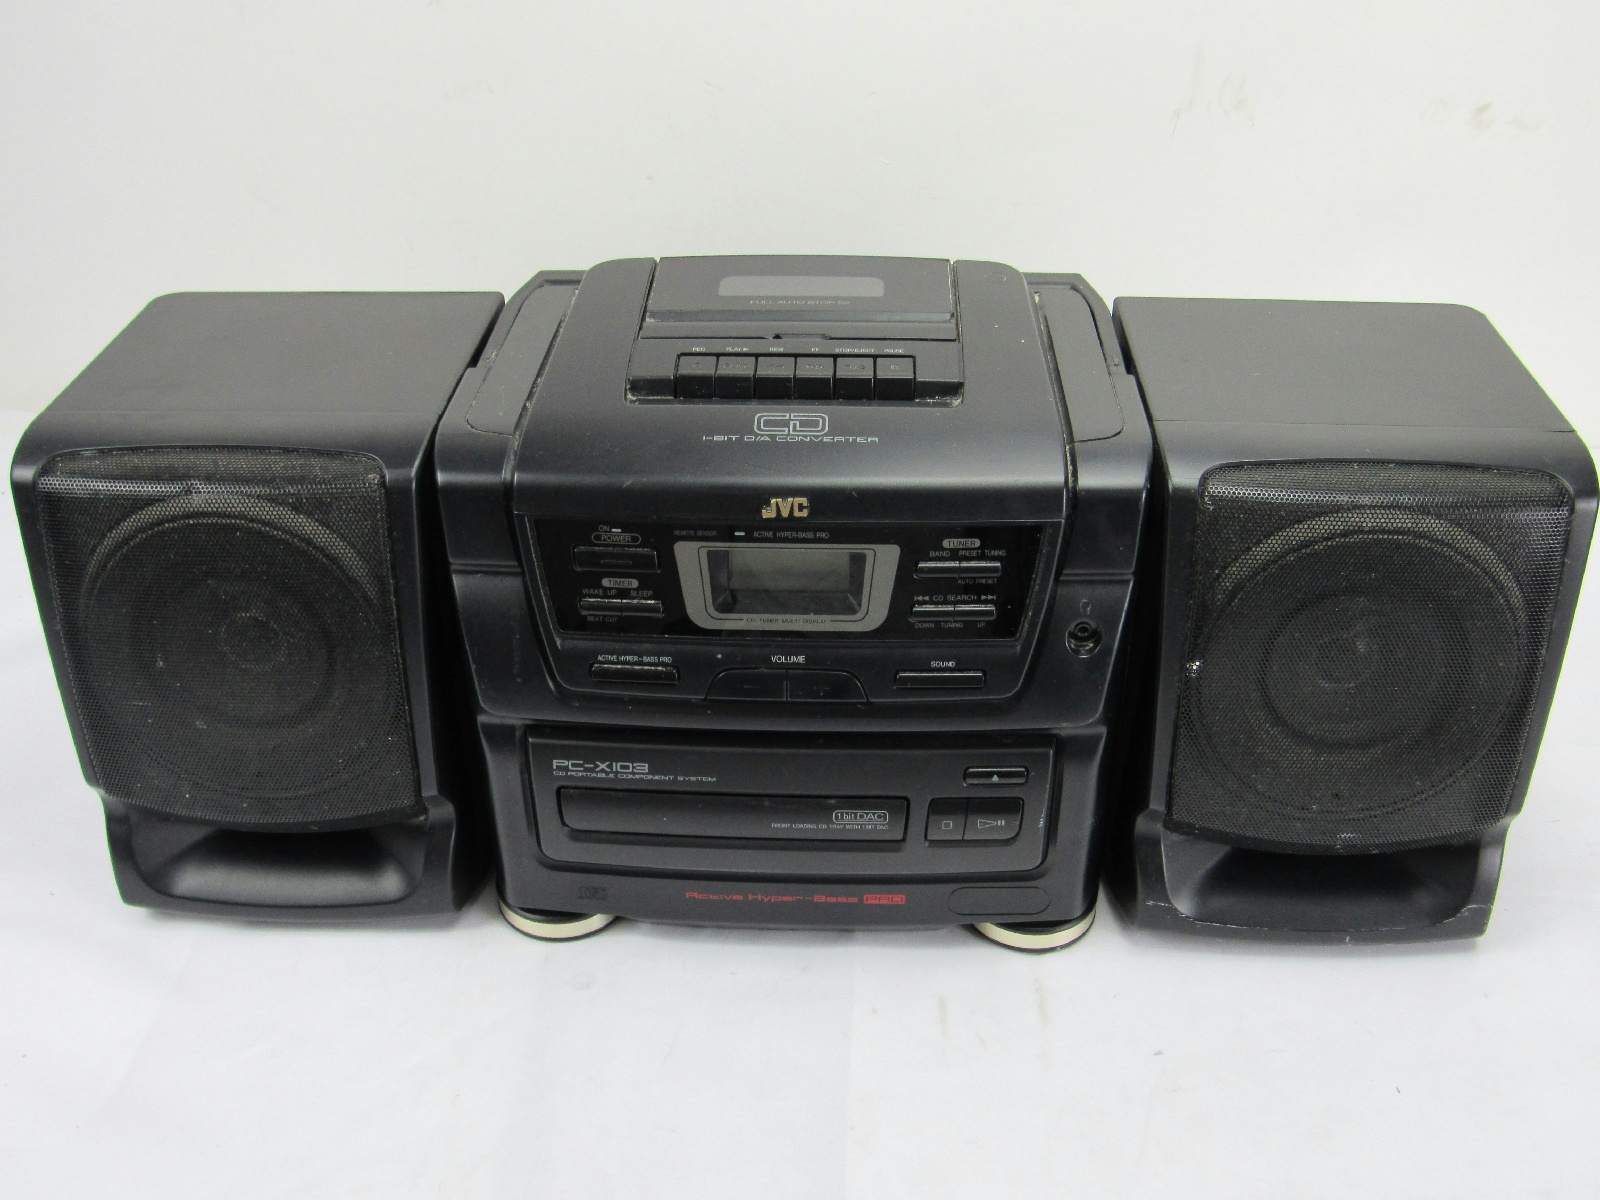 Jvc pc x103 am fm cd and tape boombox hyper bass - Mobile porta cd ...